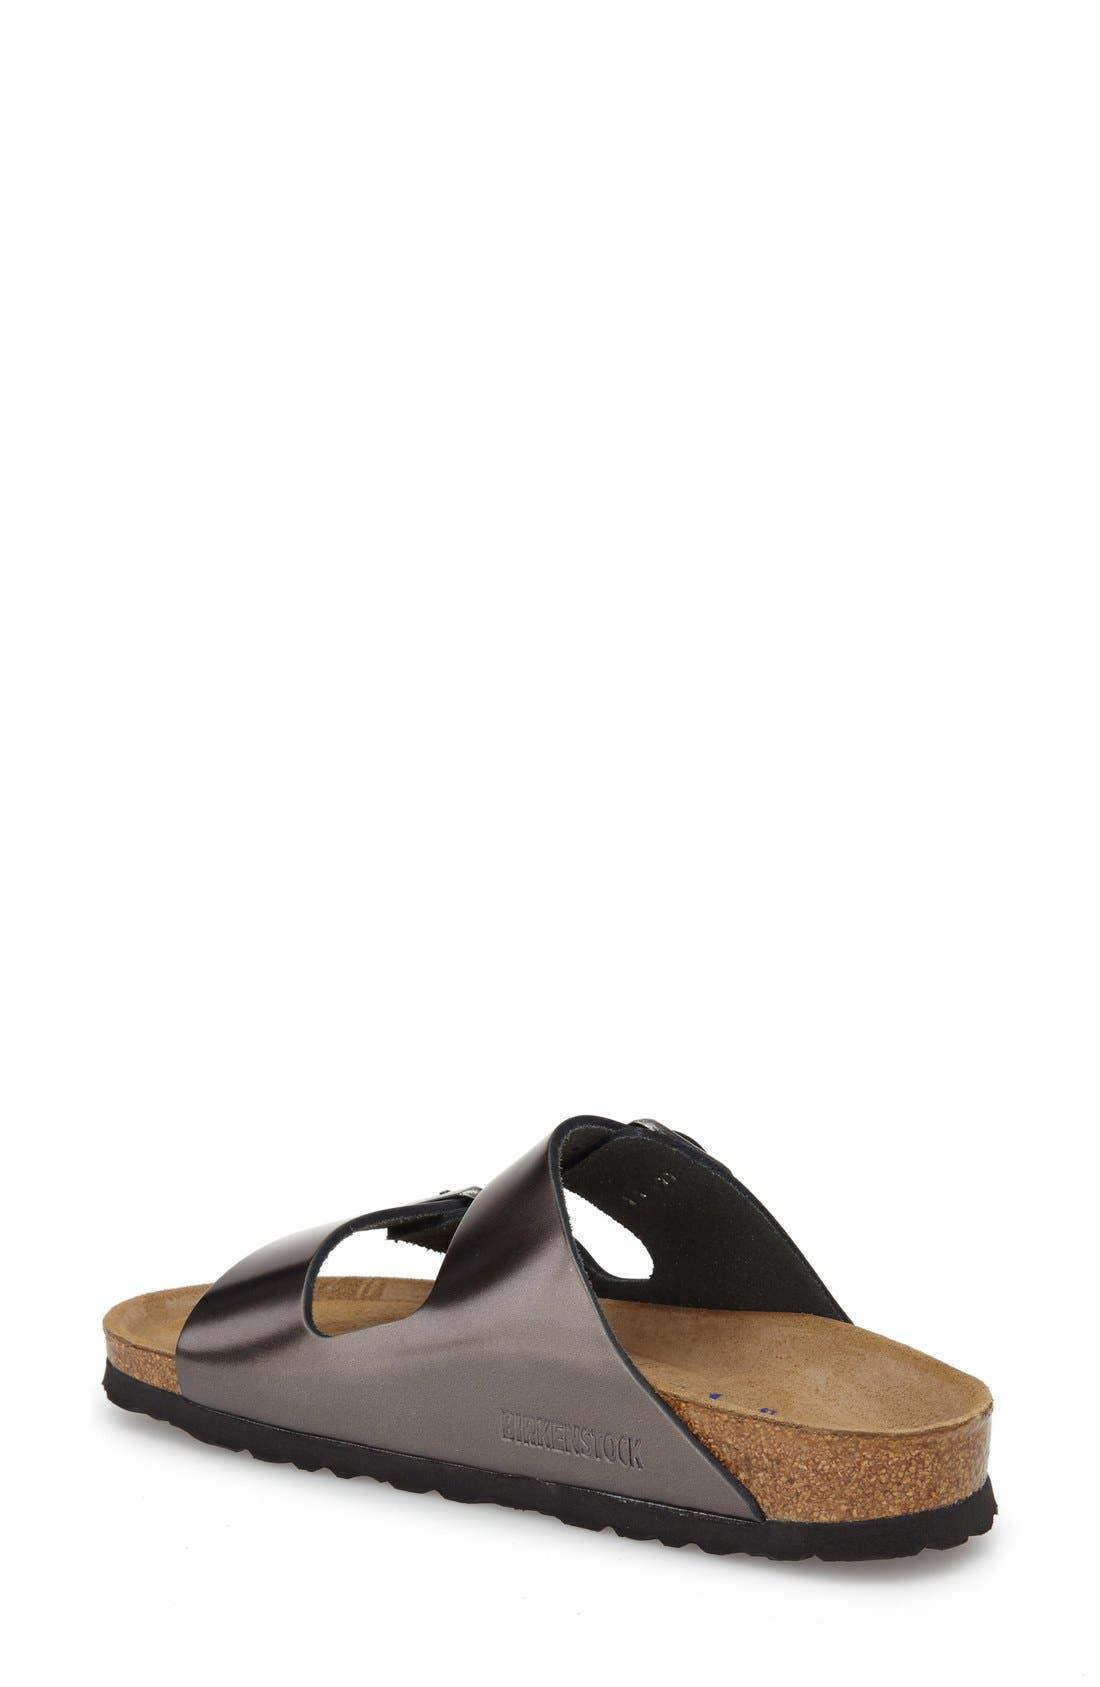 49286c5760fbf Women s Sandals